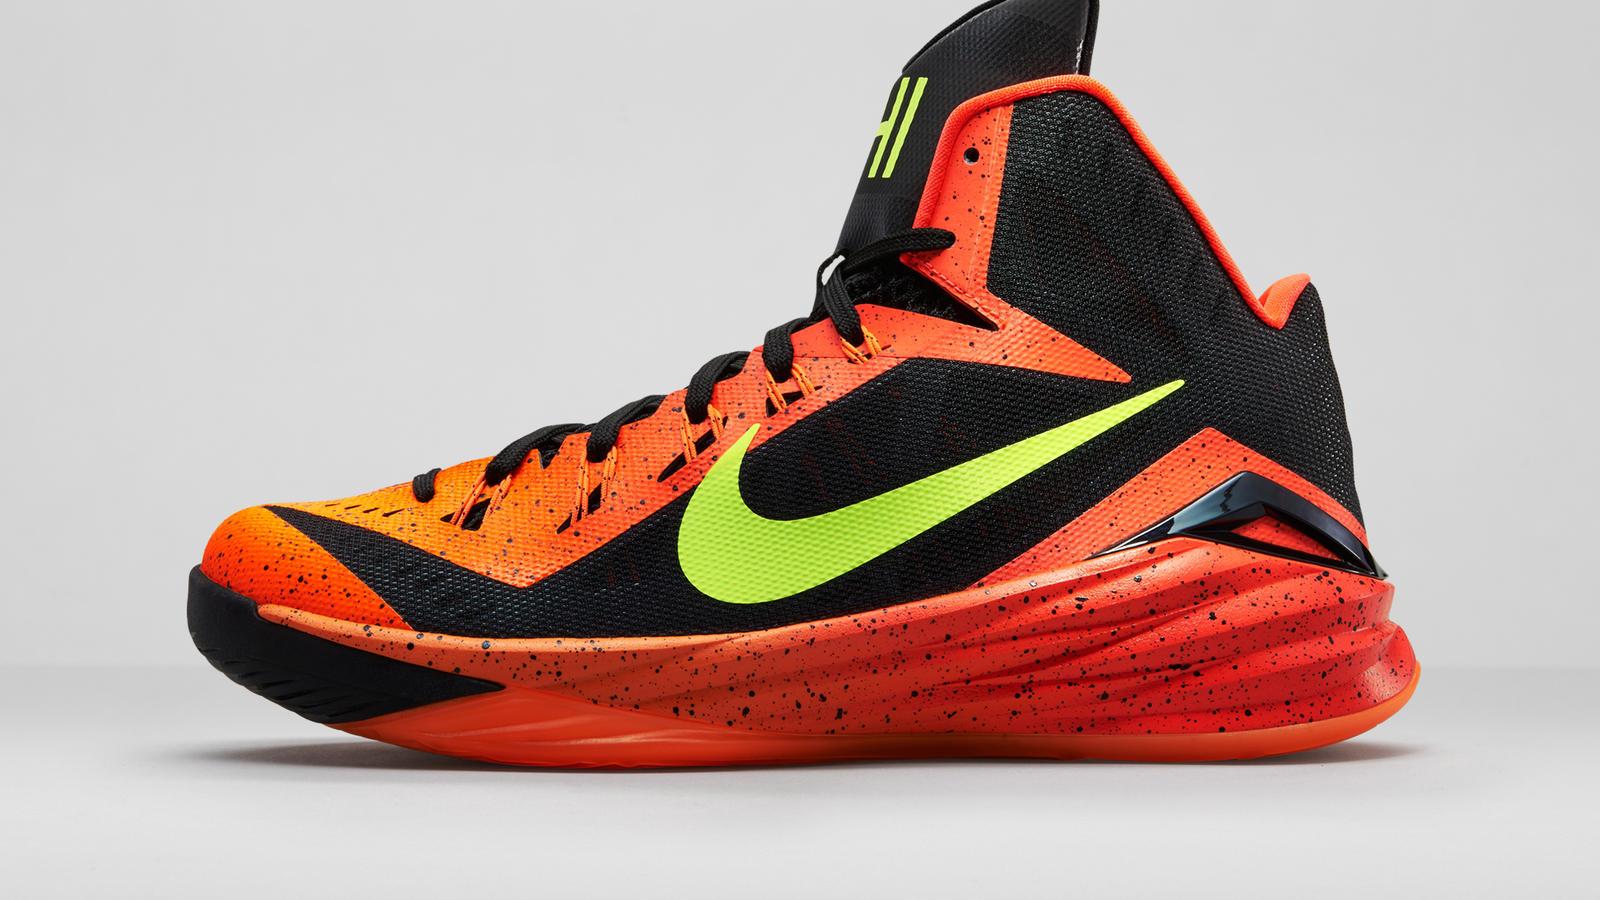 sneakers for cheap 4b162 40cd0 Best Nike Hyperdunk 2015 Cheap sale LA City Pack